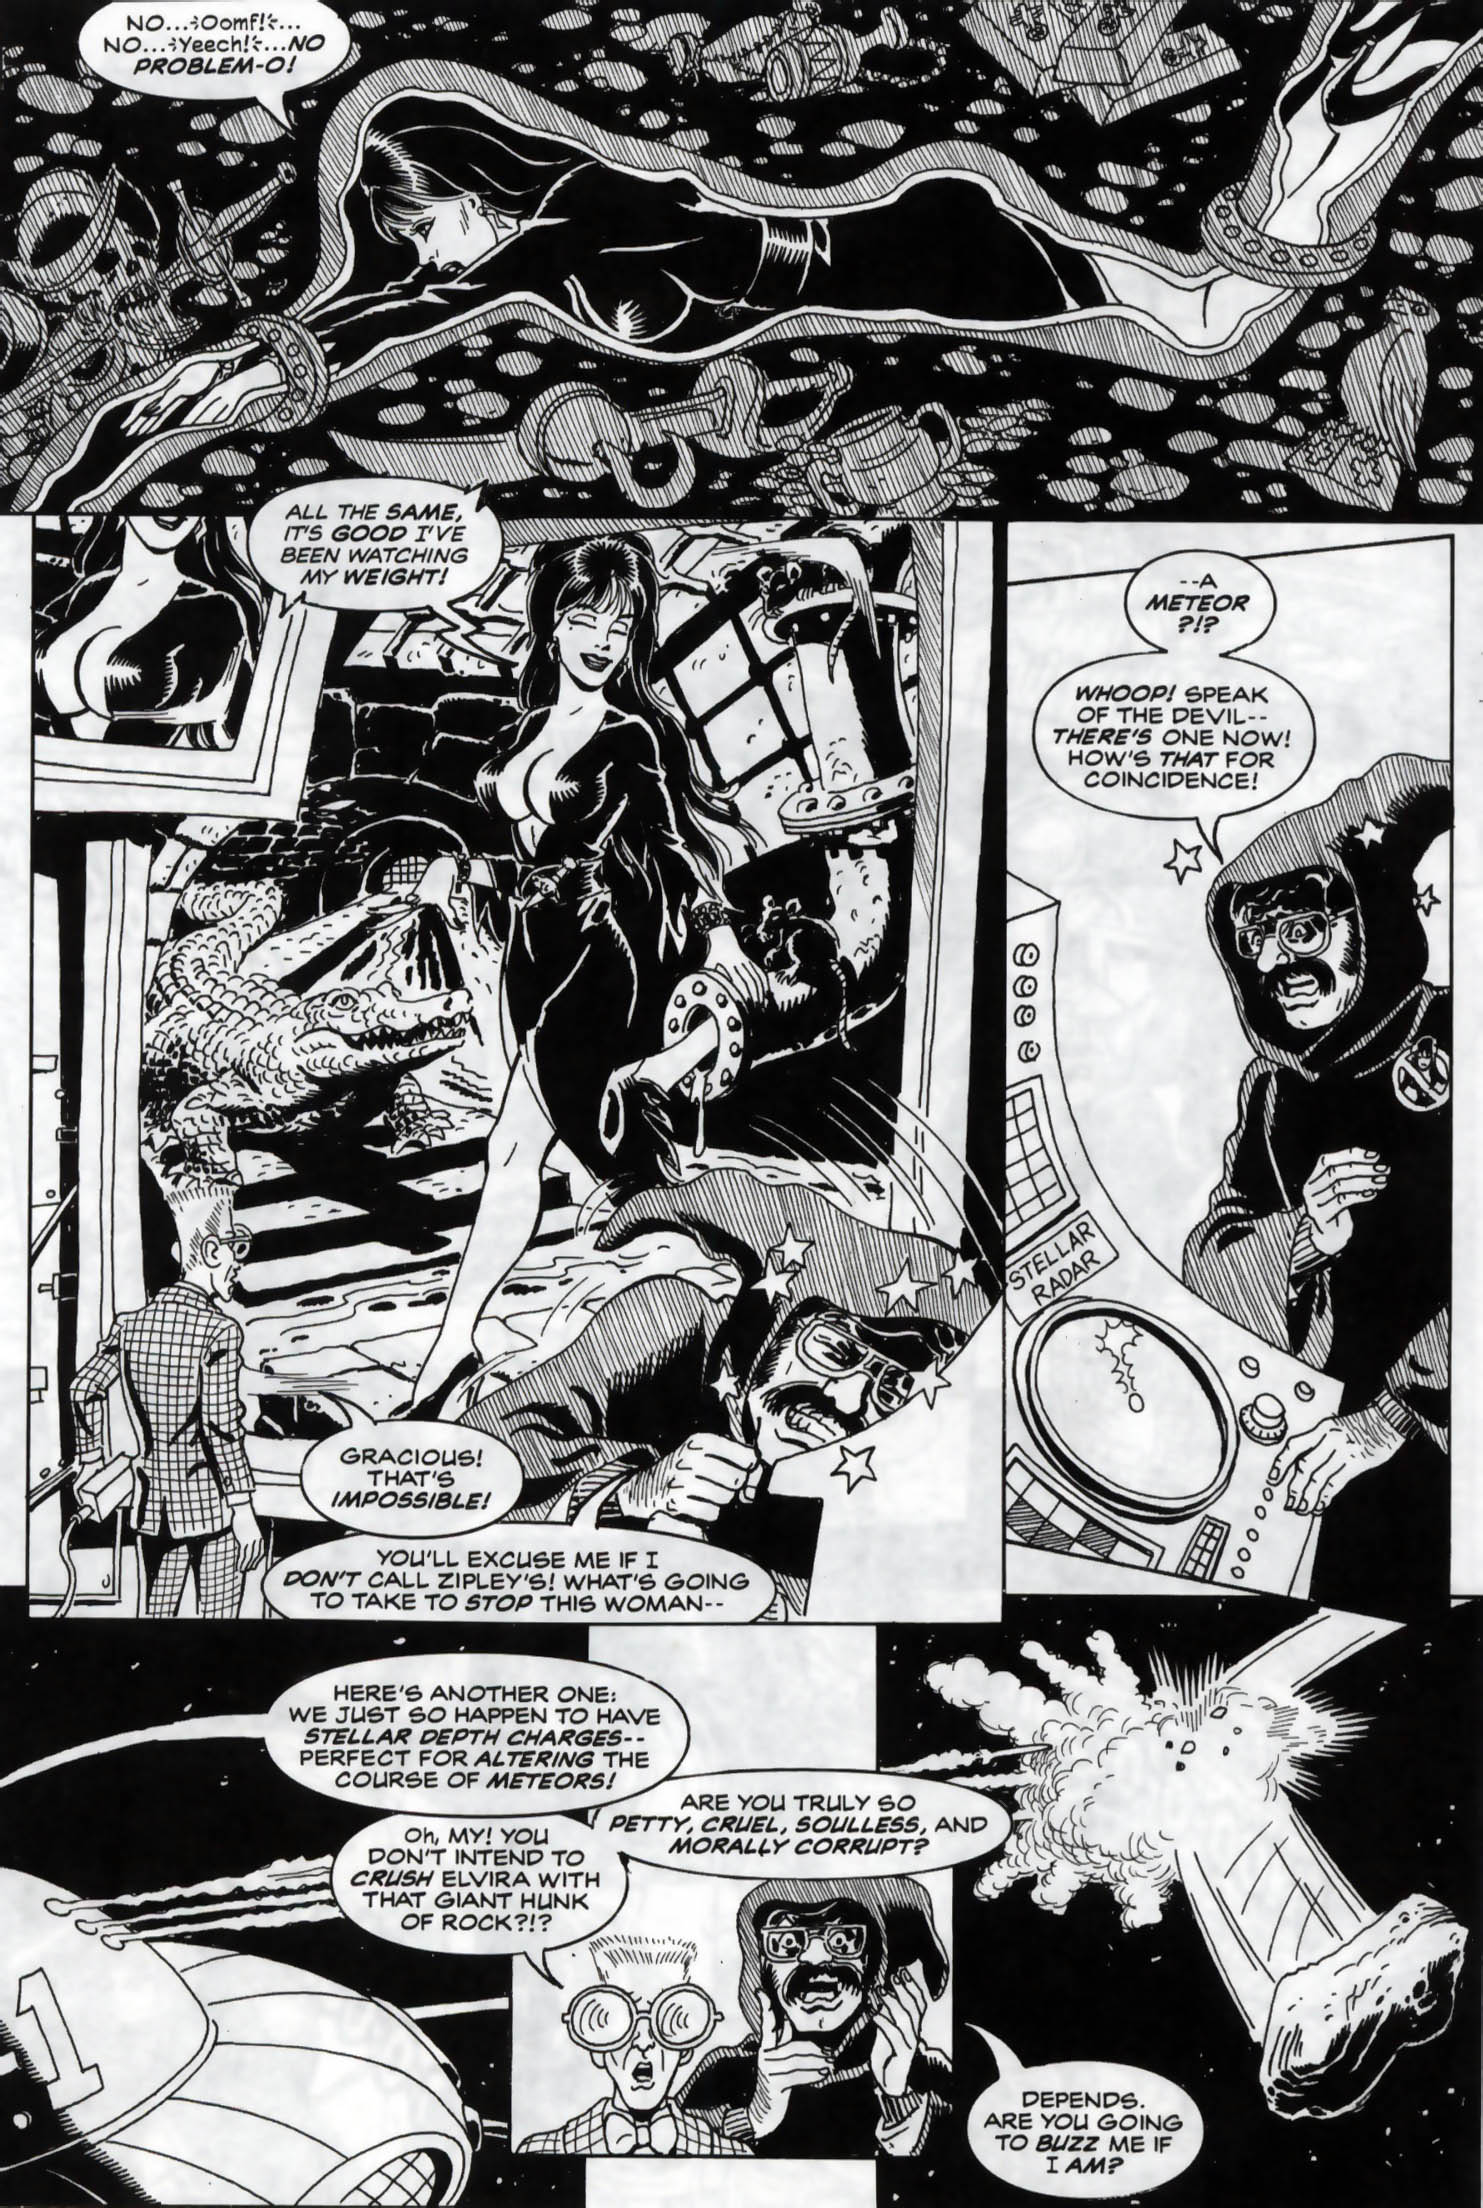 Read online Elvira, Mistress of the Dark comic -  Issue #120 - 15